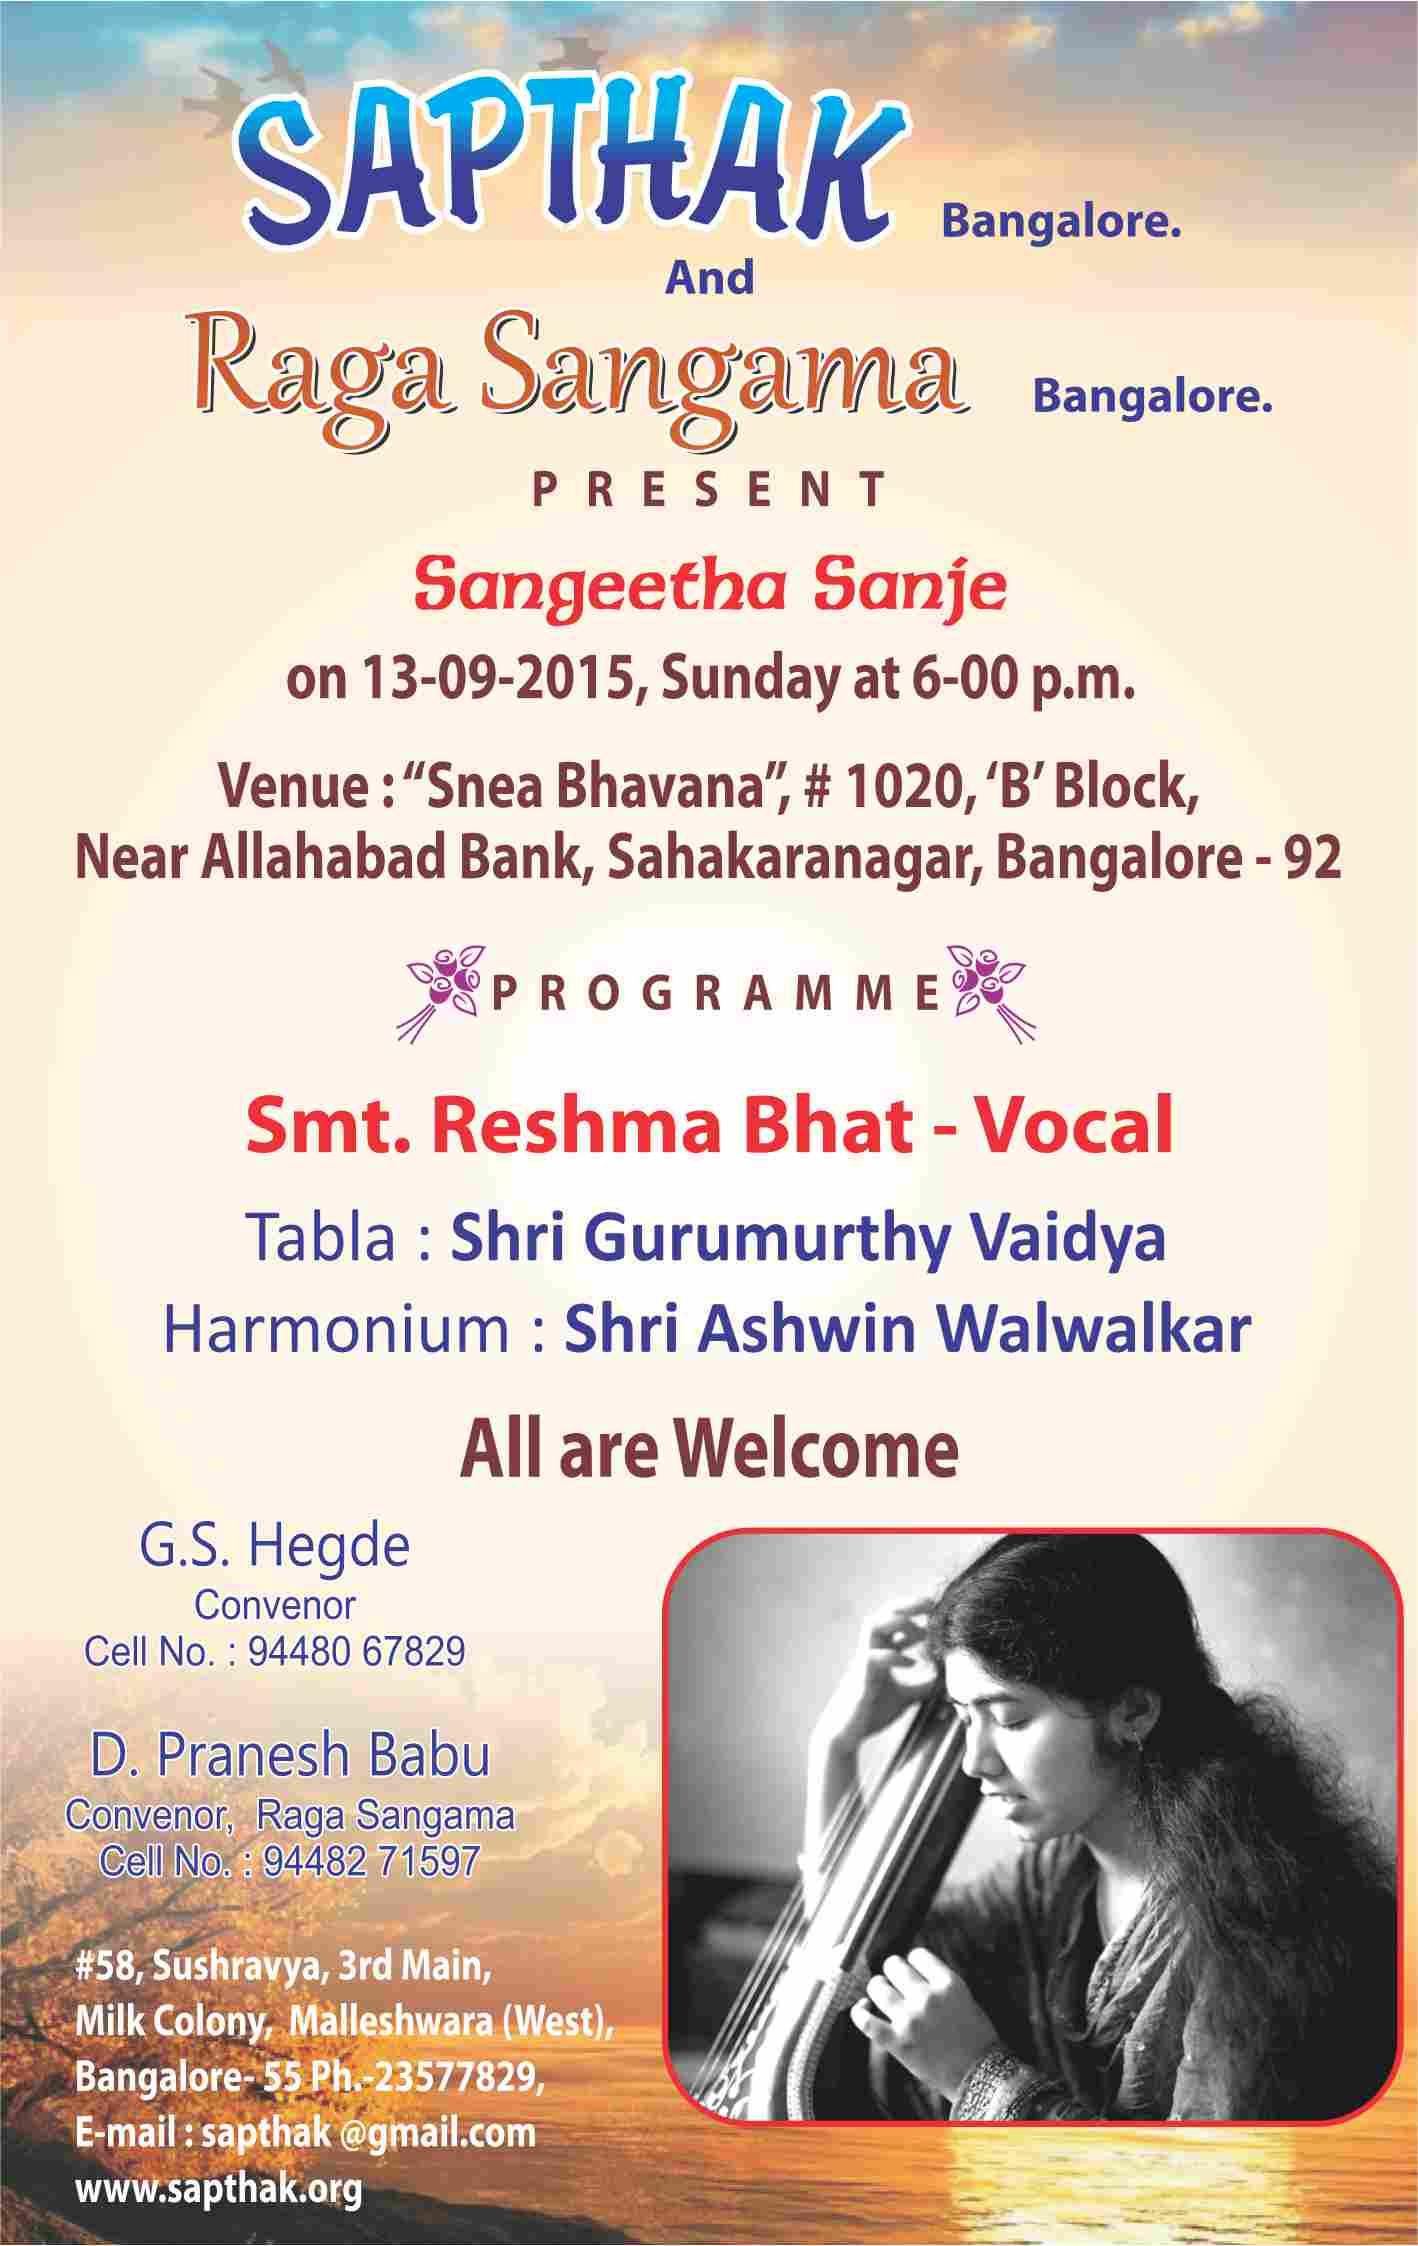 13-09-2015 Banglore.jpg